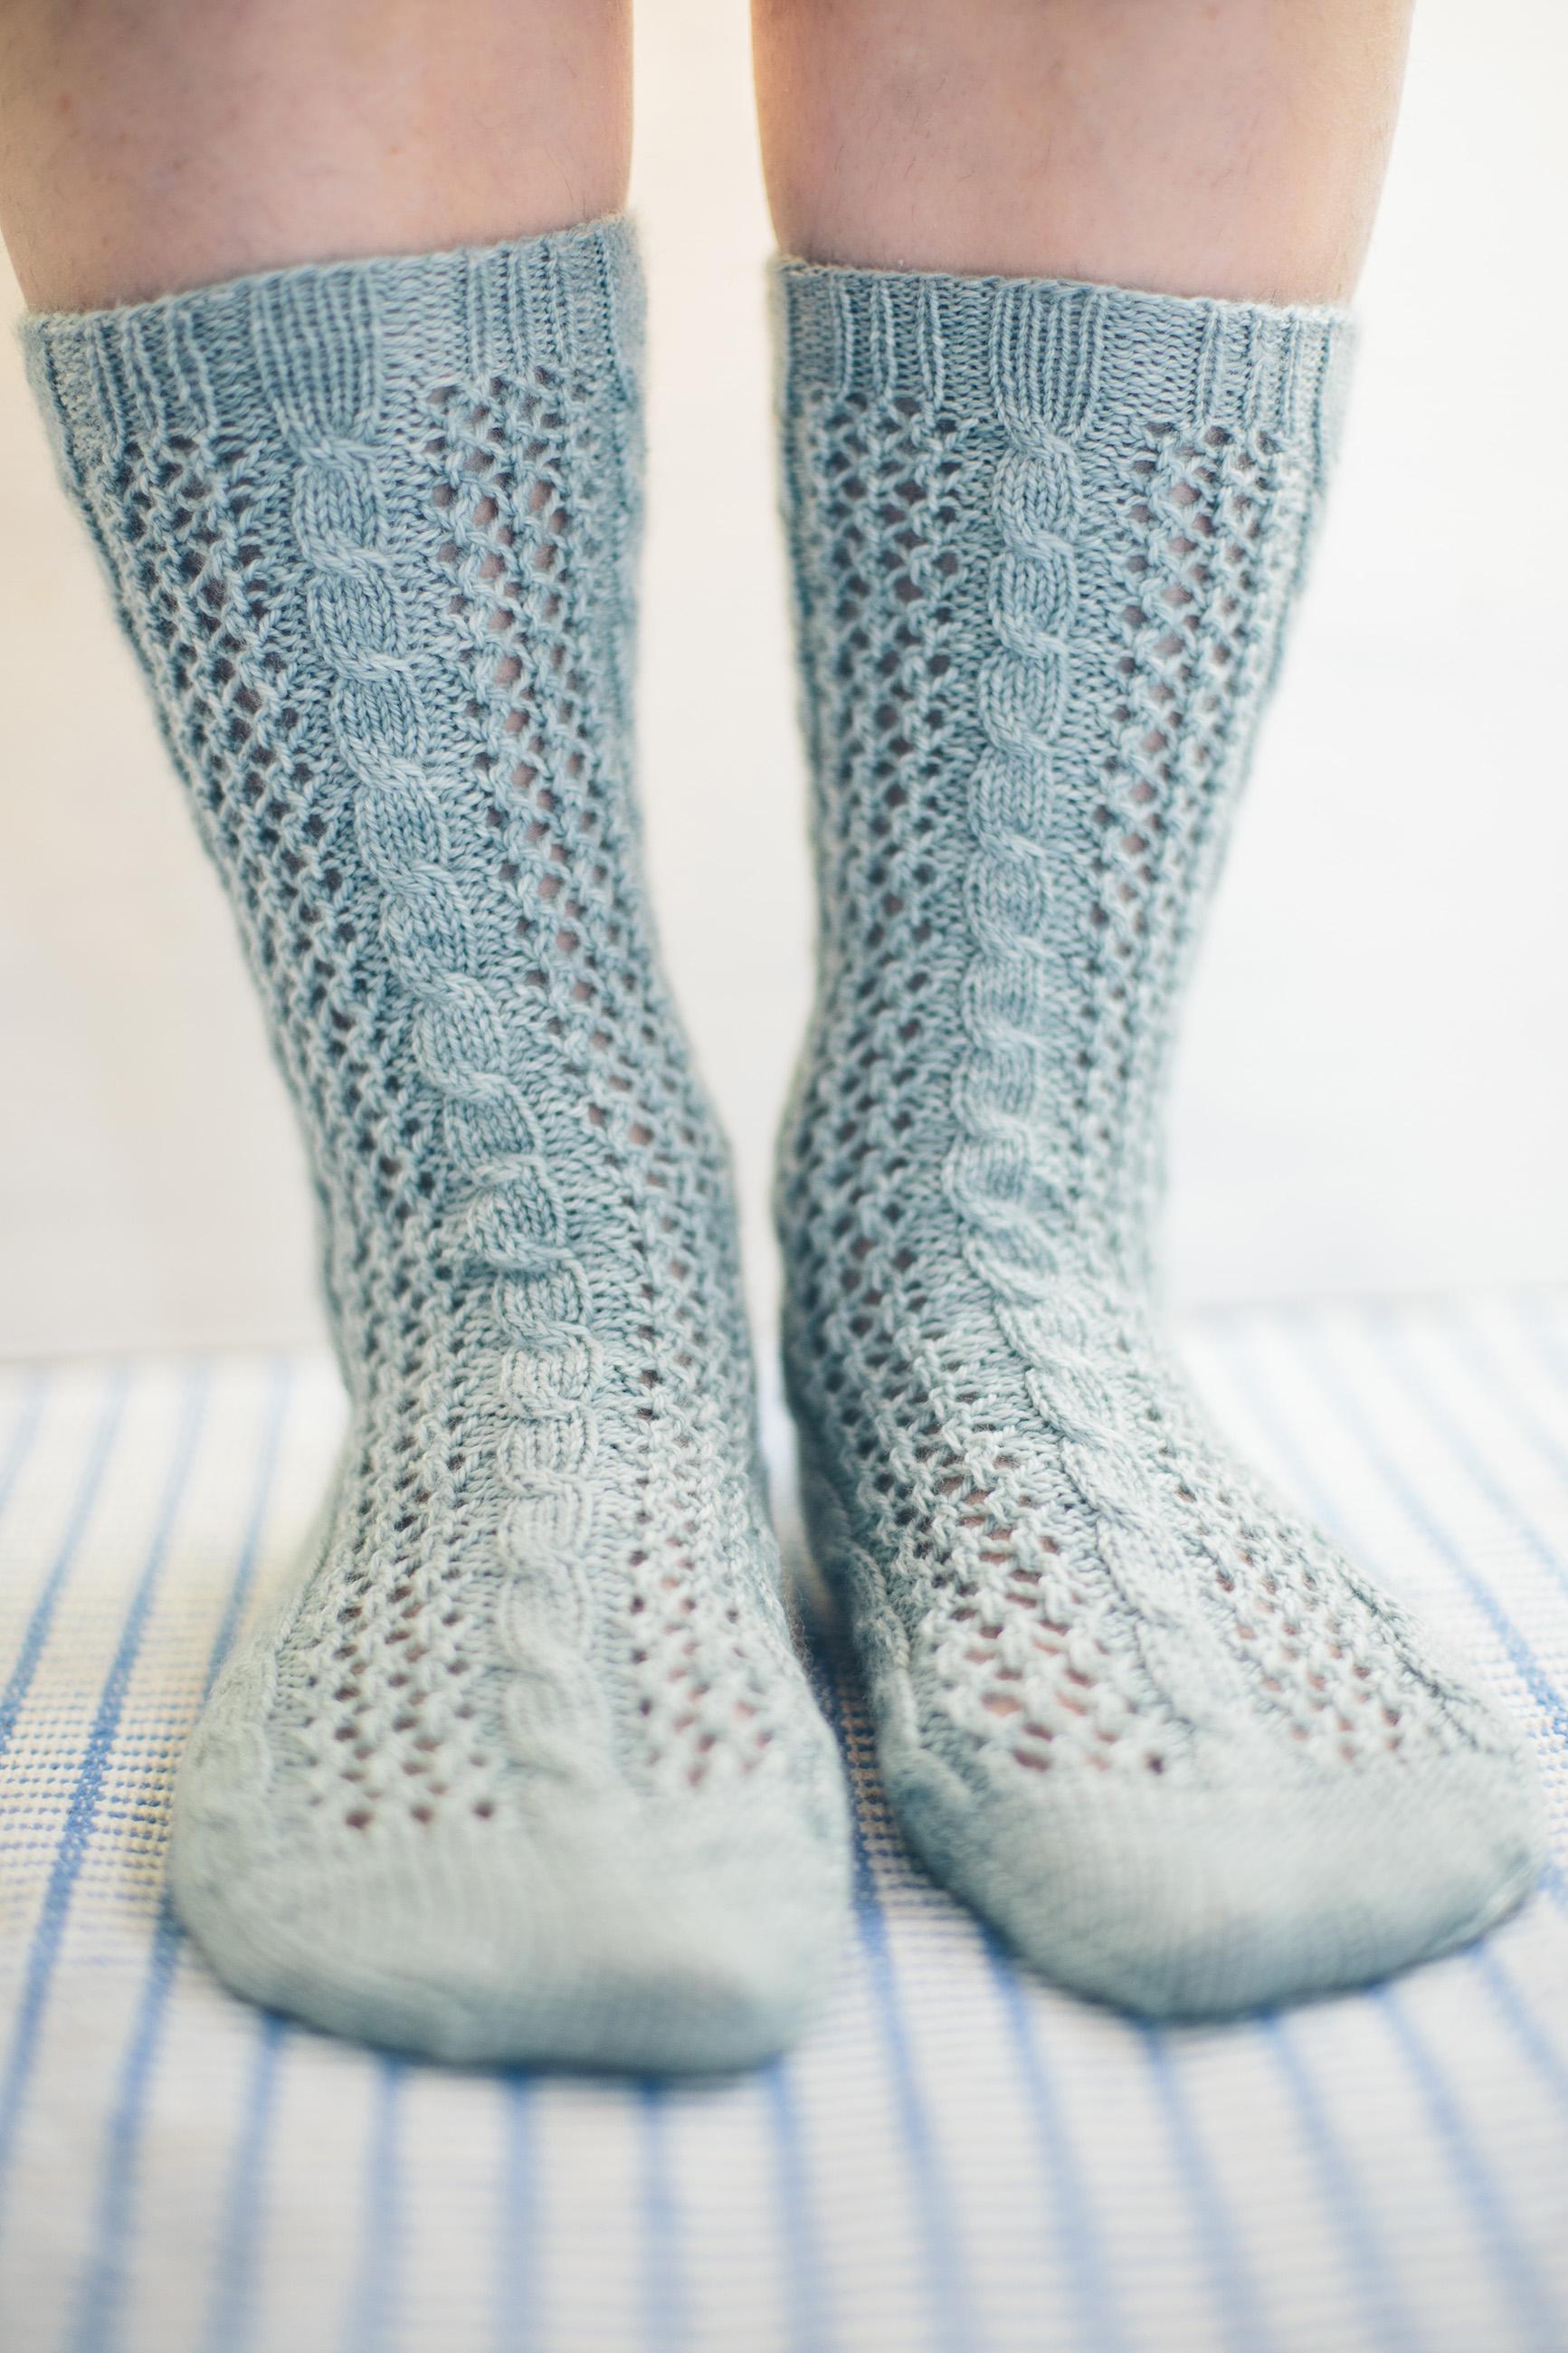 twisting ivy sock knitting pattern jane burns